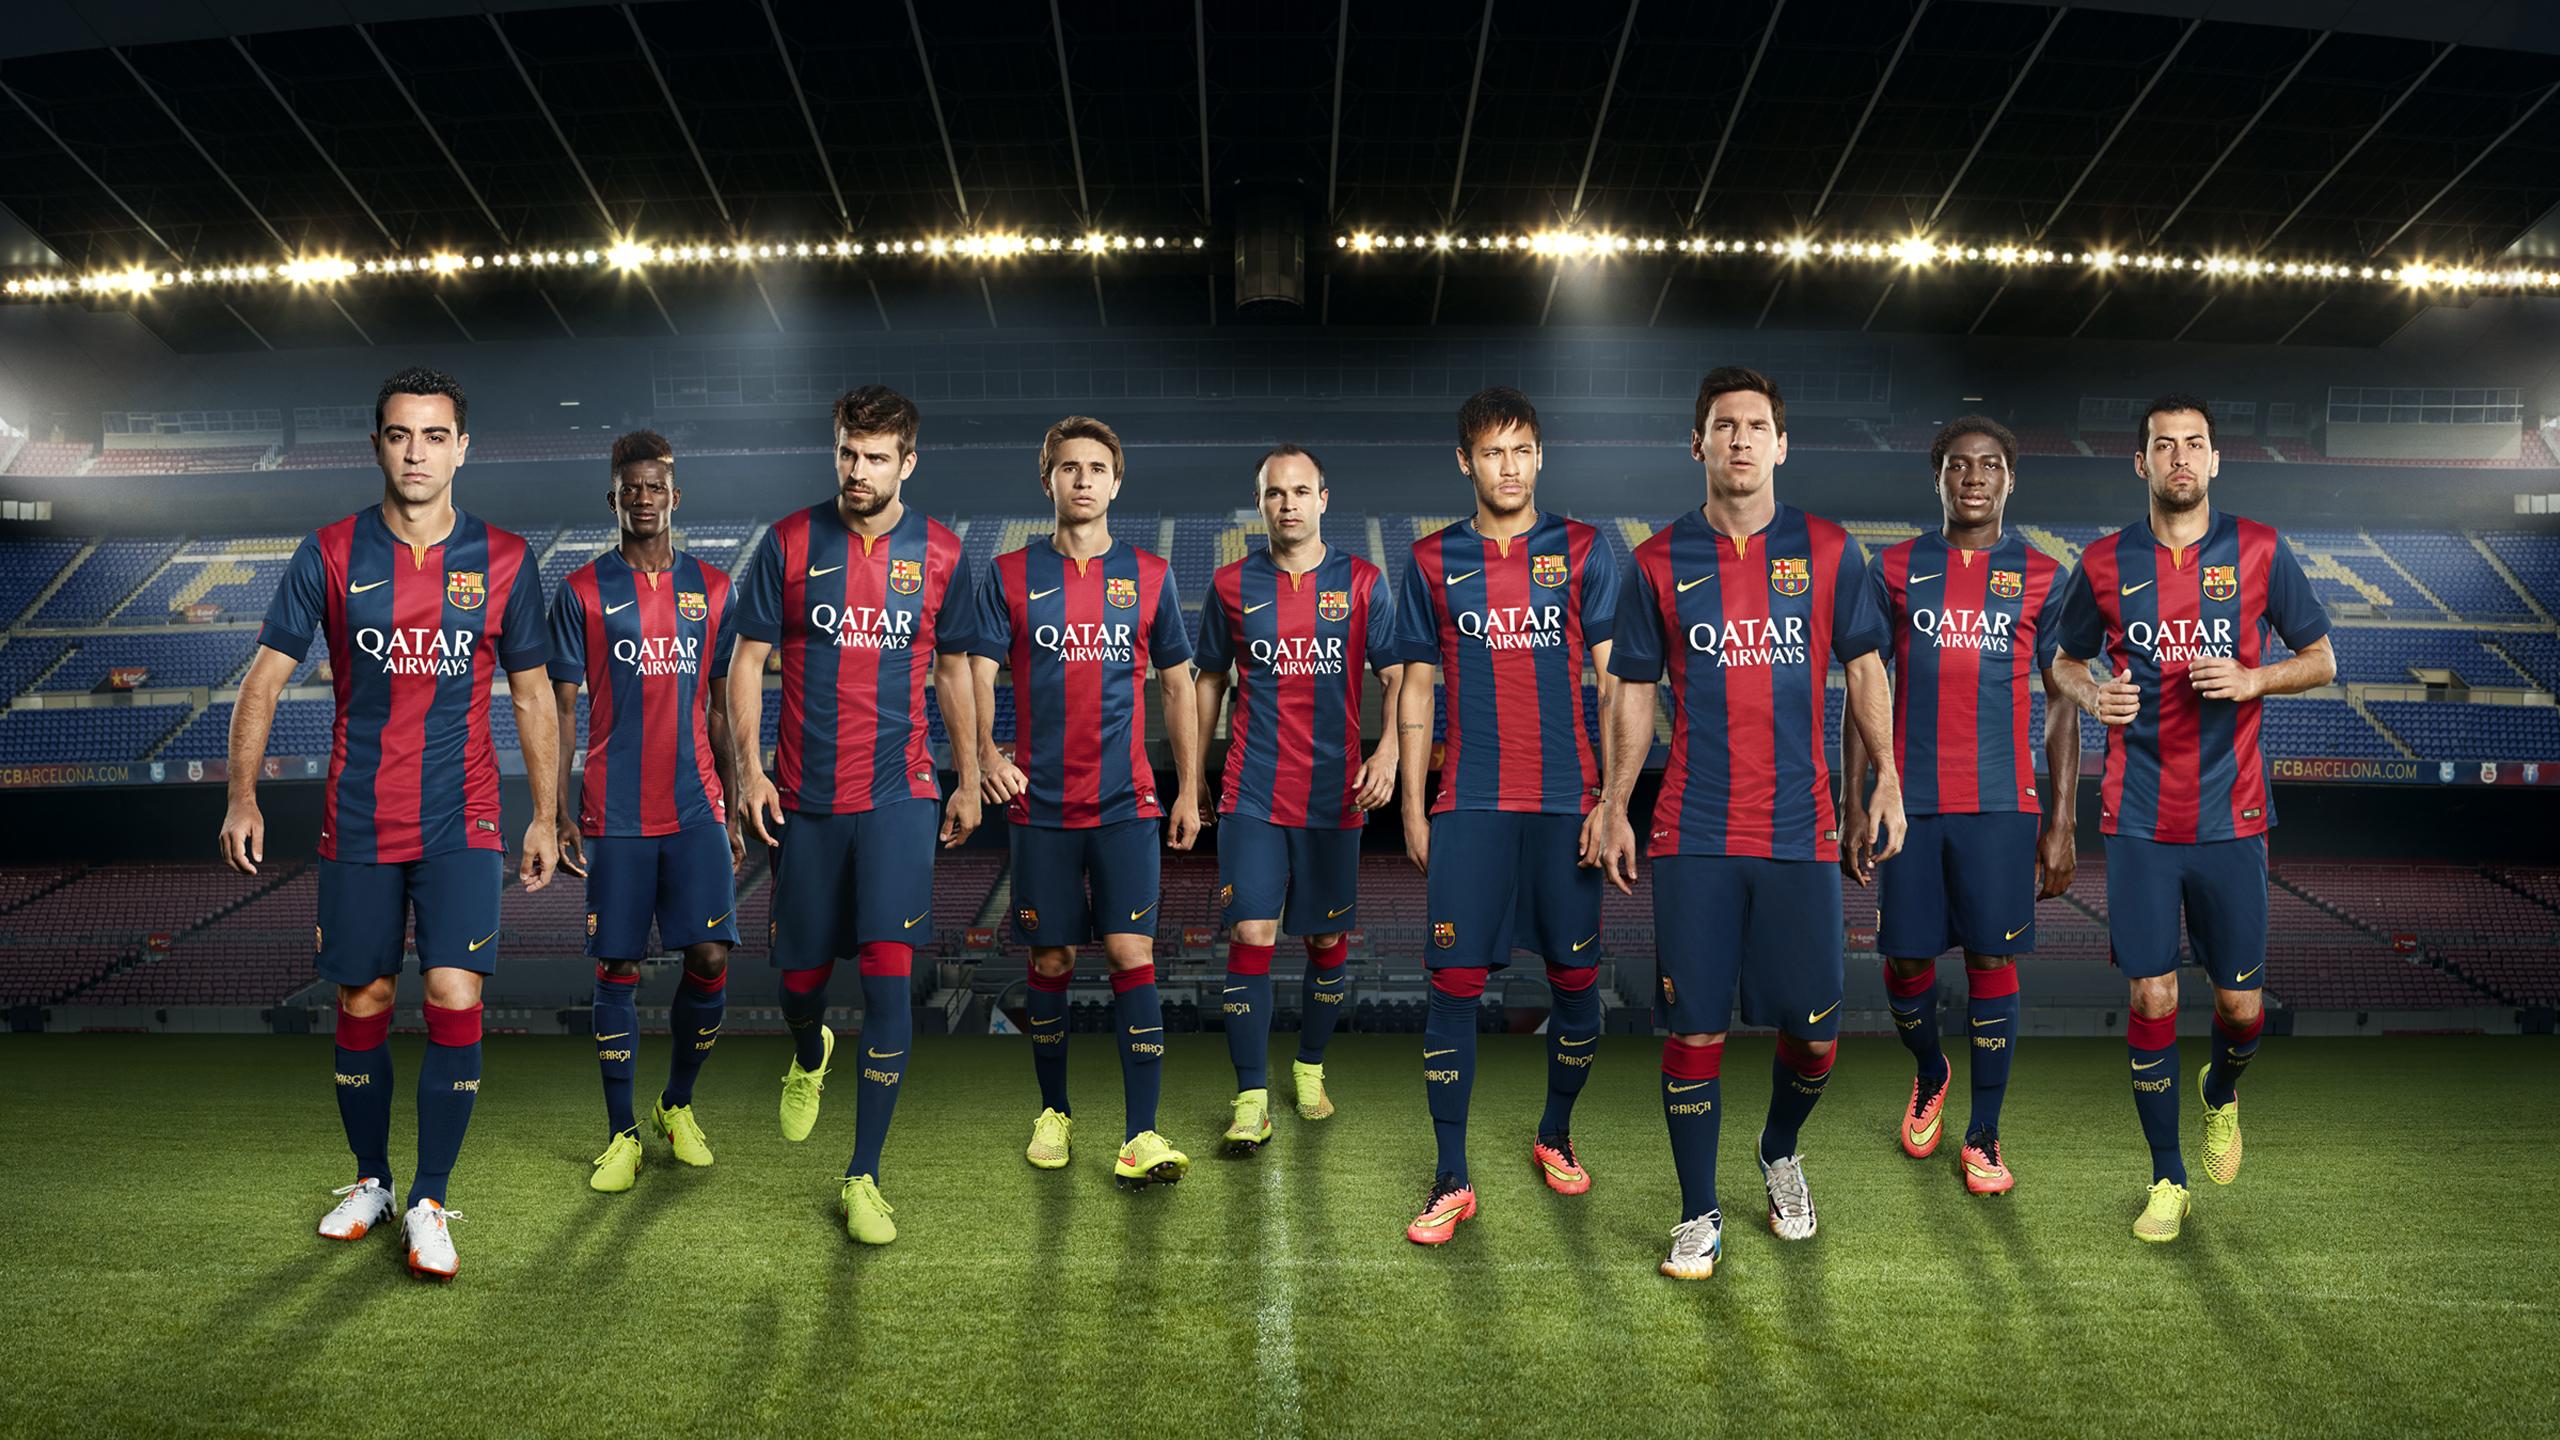 Download Fc Barcelona Wallpaper 4K